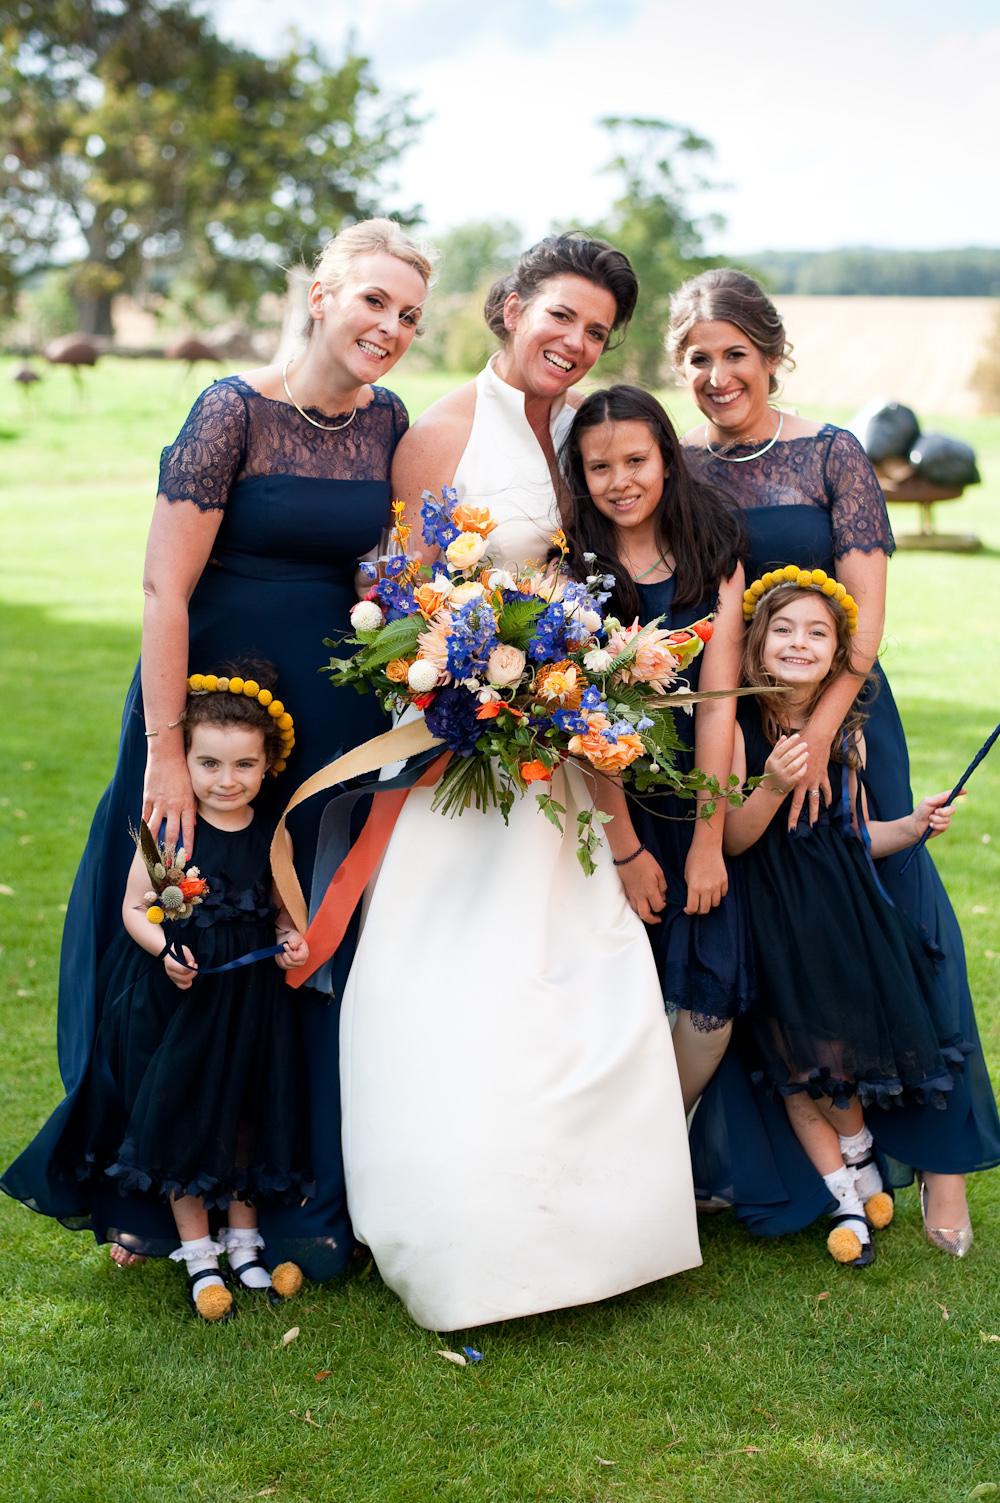 Bridesmaids Bridesmaid Dress Dresses Navy Floral Wedding Rachael Connerton Photography